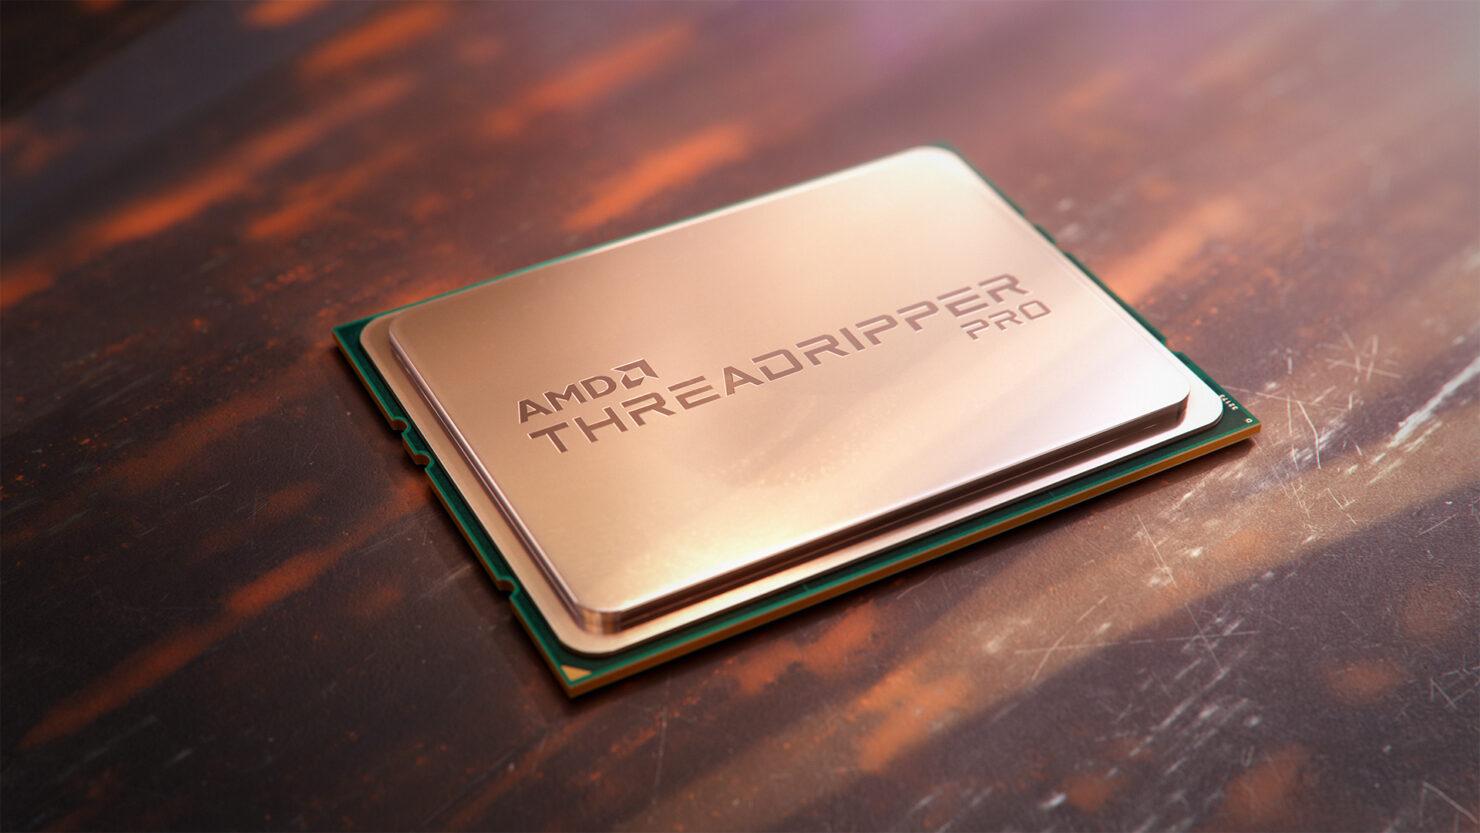 amd-ryzen-threadripper-pro-5995wx-64-core-cpu-benchmarked-on-sharkstooth-platform